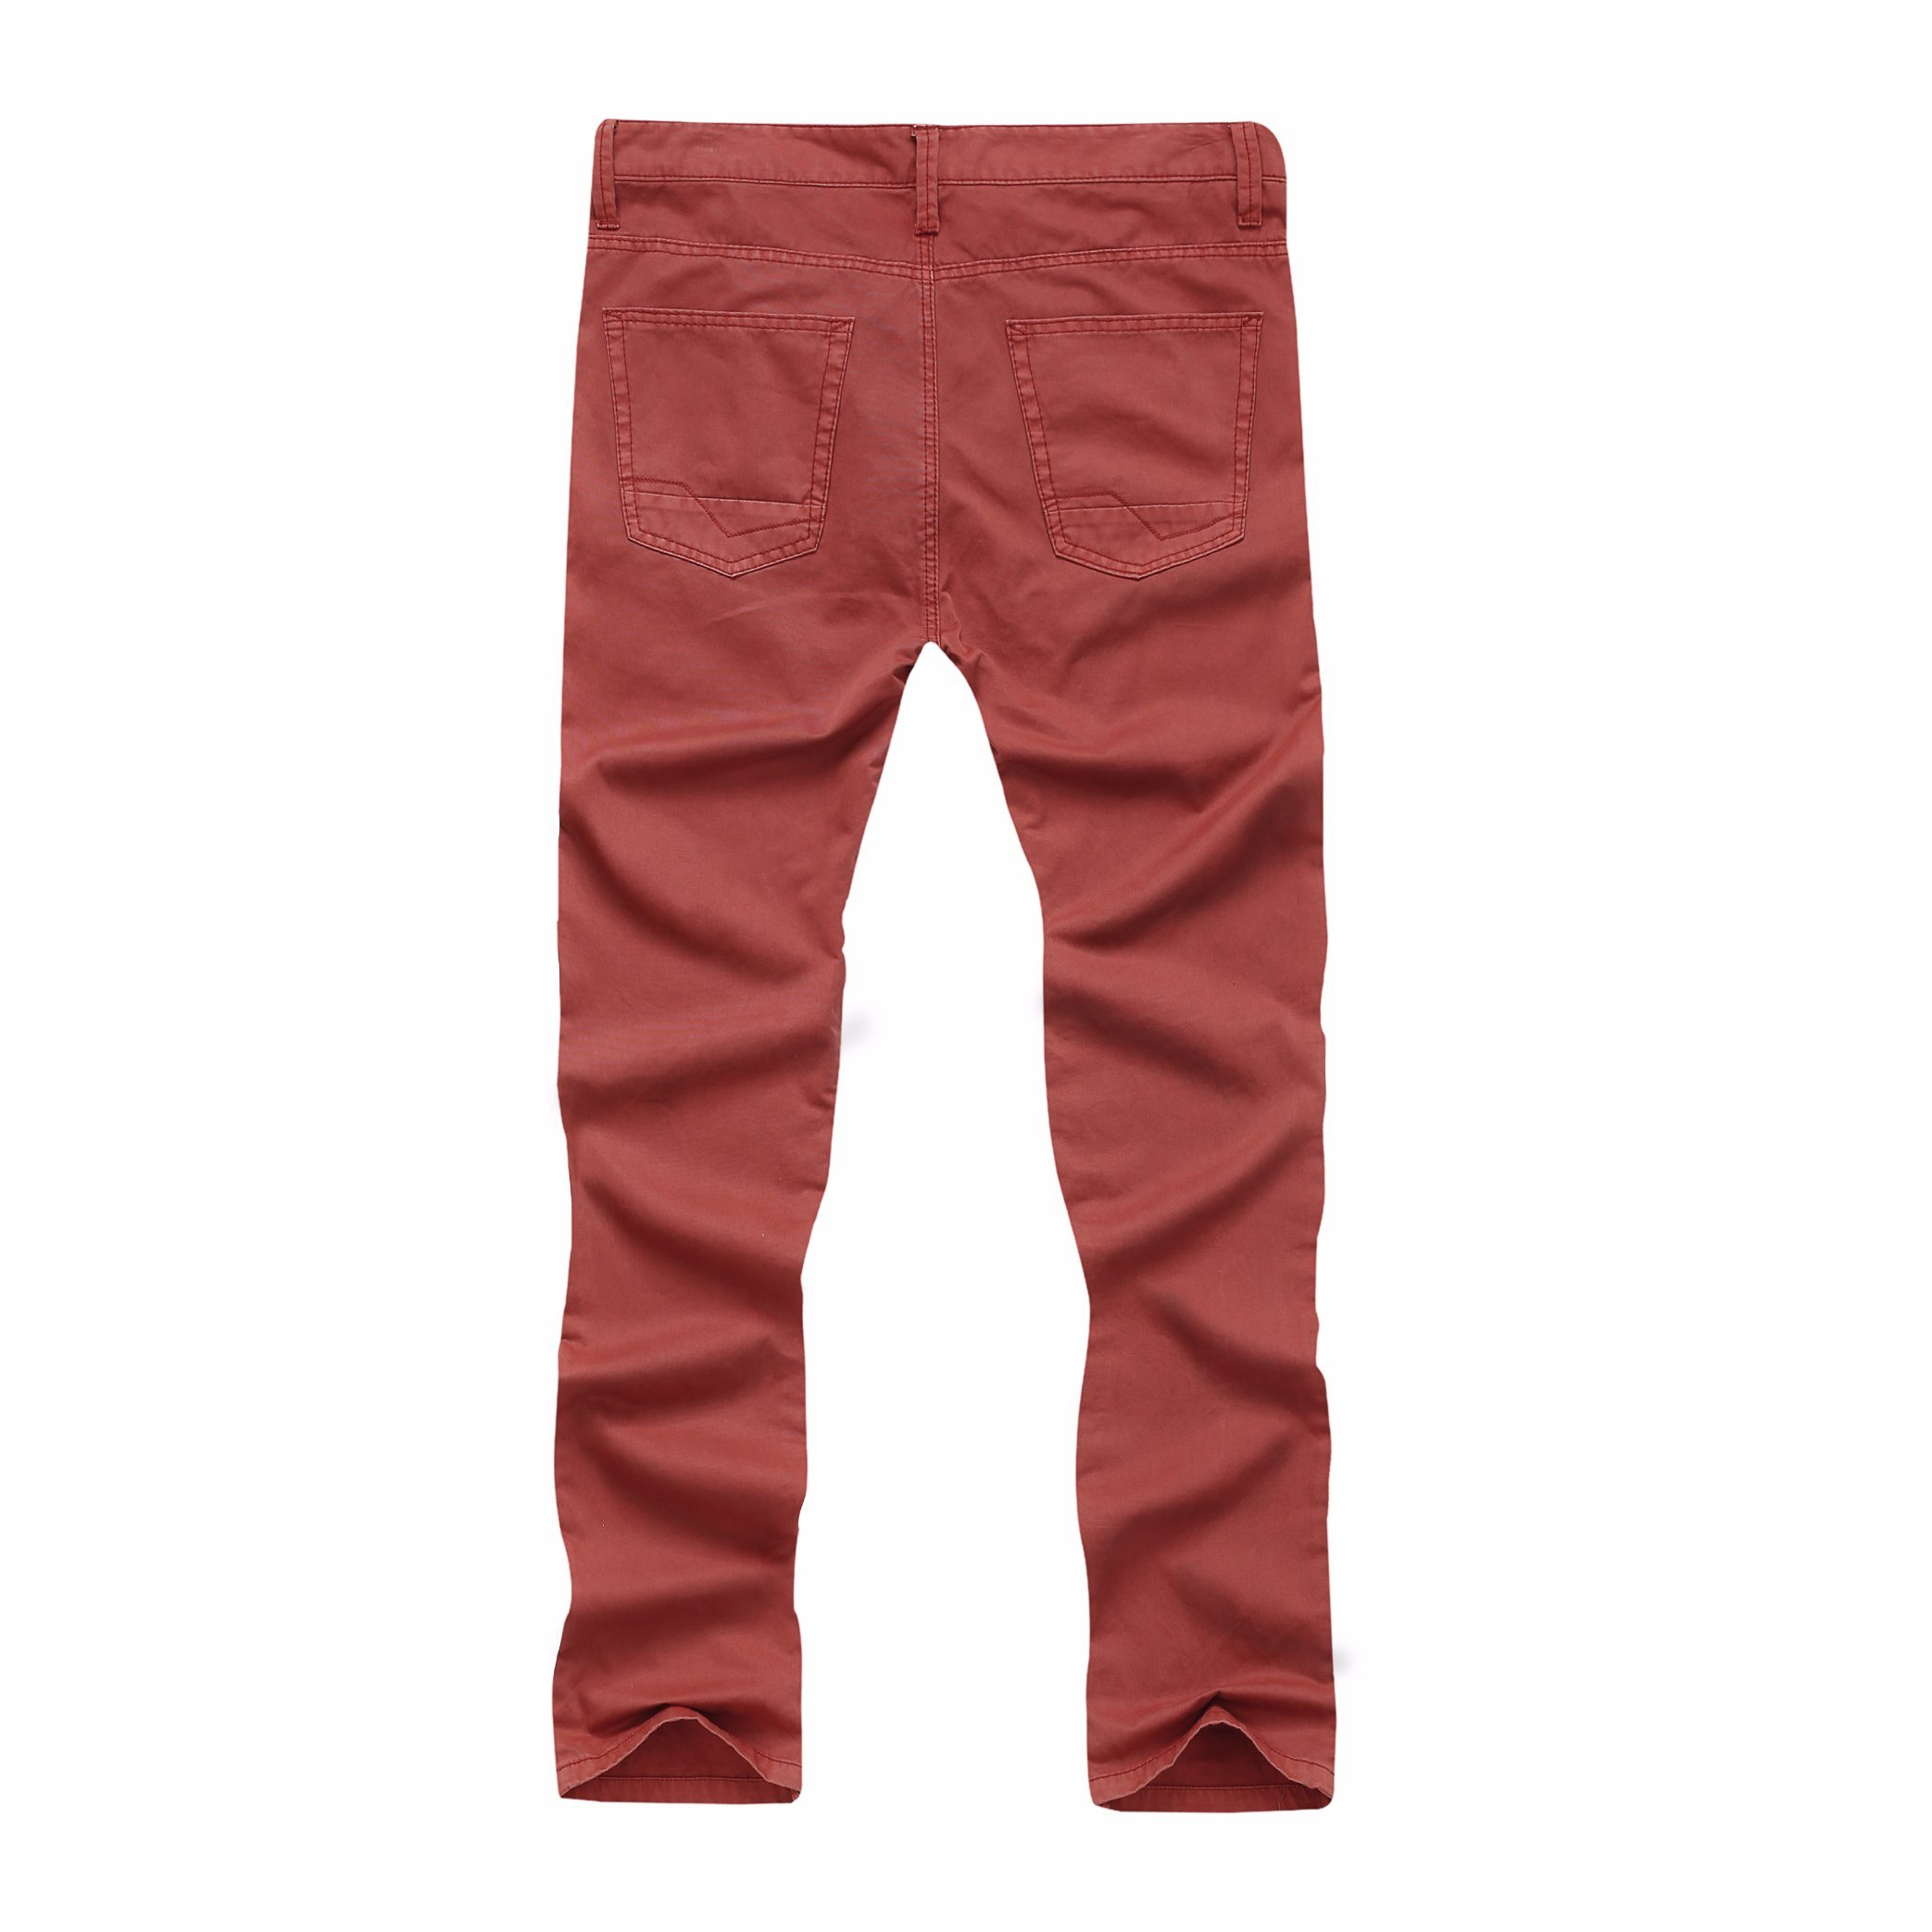 Men Cotton Fashion High Quality Casual Long Pants